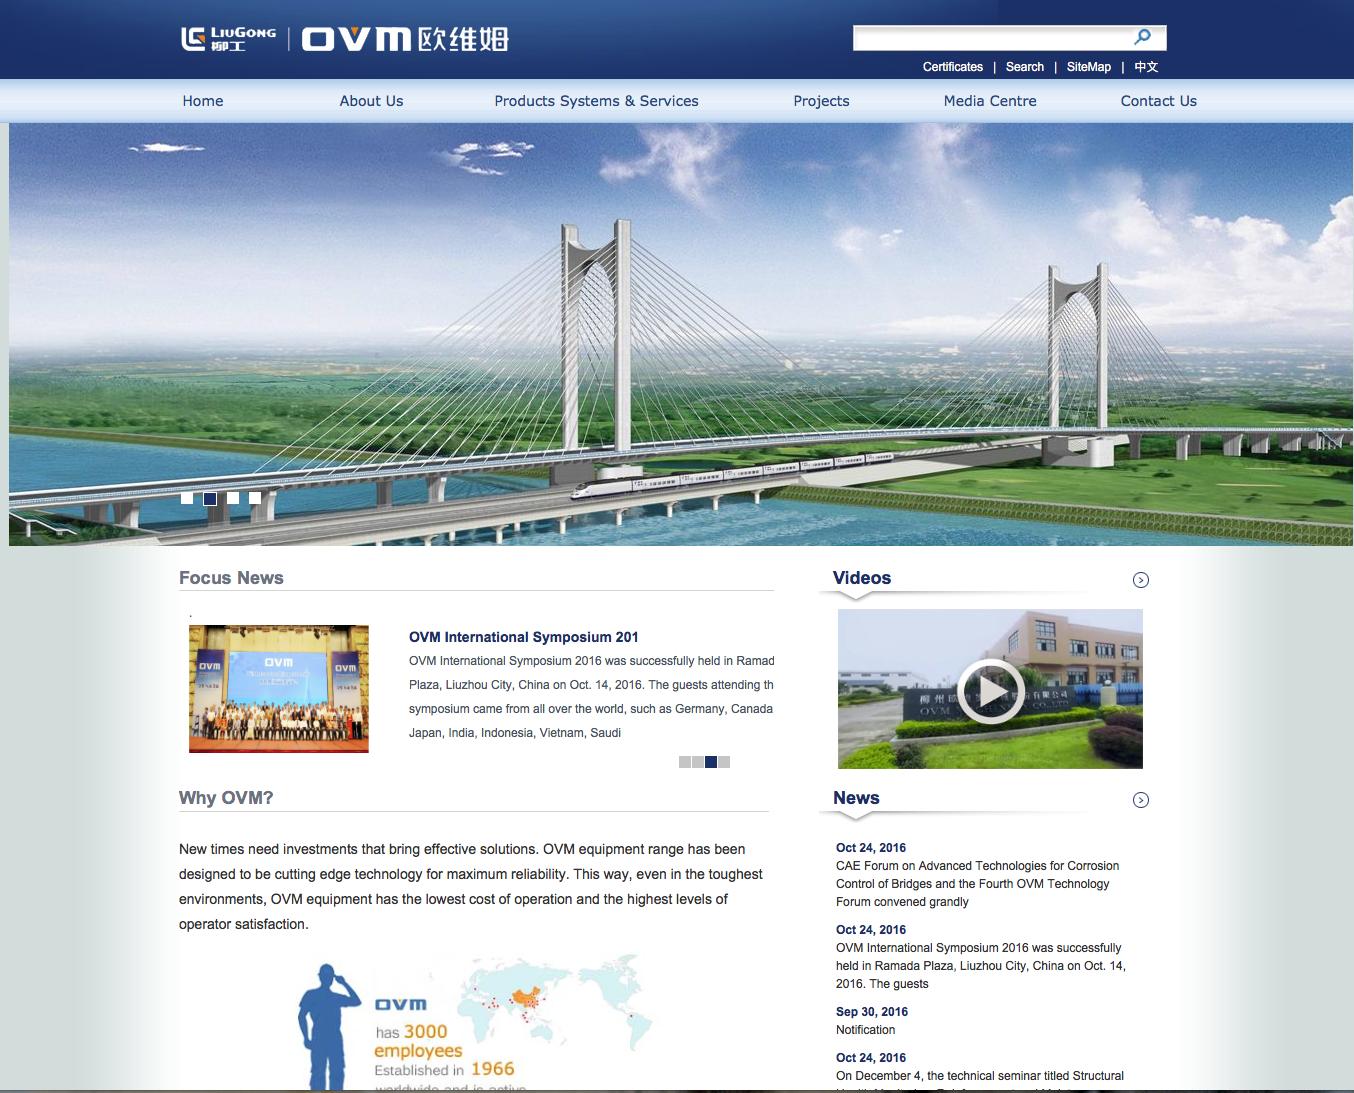 Proofreading a translation for OVM International